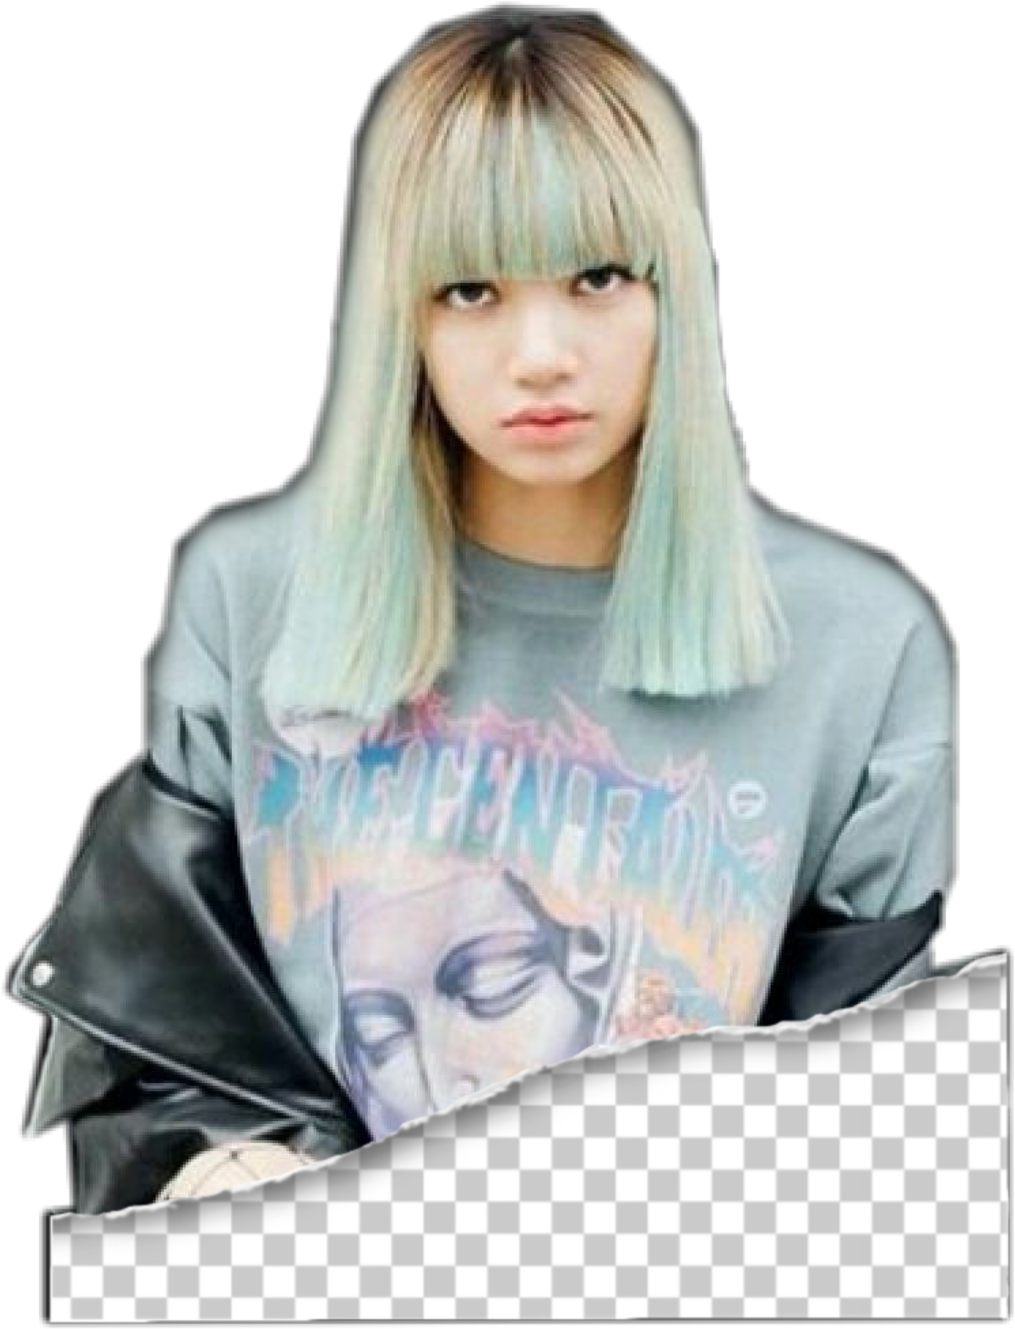 lisa blackpink stay kpop - Sticker by coco